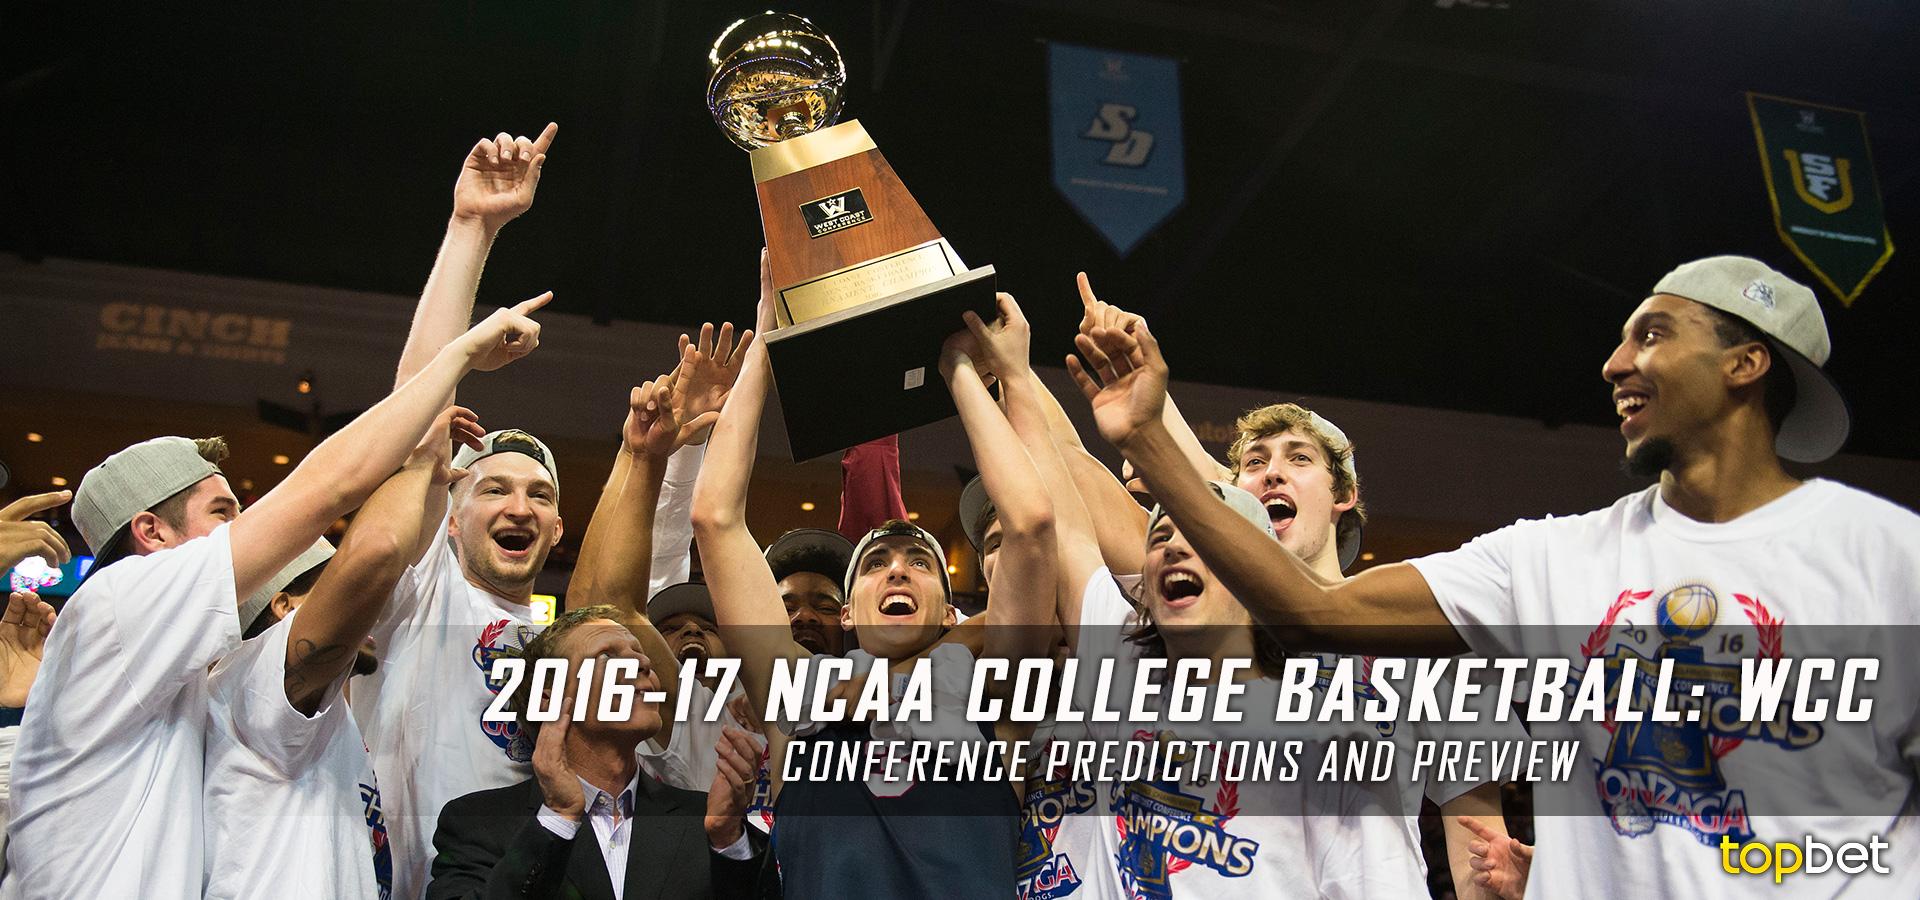 Kentucky Wildcats Basketball 2016 17 Season Preview: 2016-17 WCC College Basketball Predictions & Preview